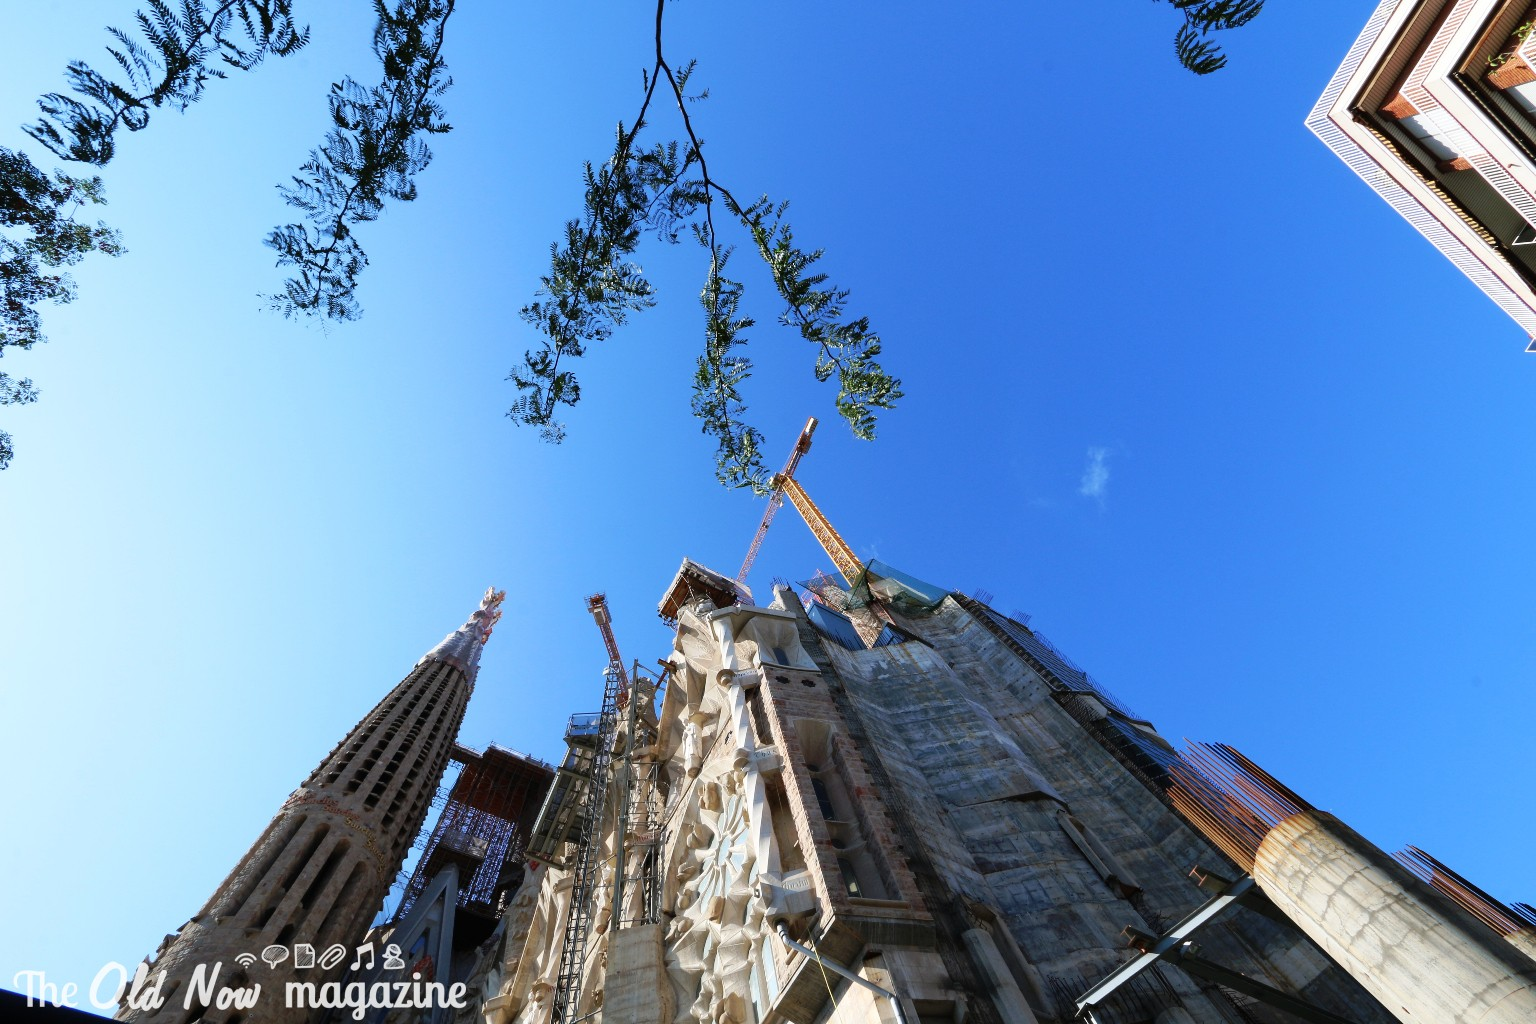 Barcellona THEOLDNOW (212)